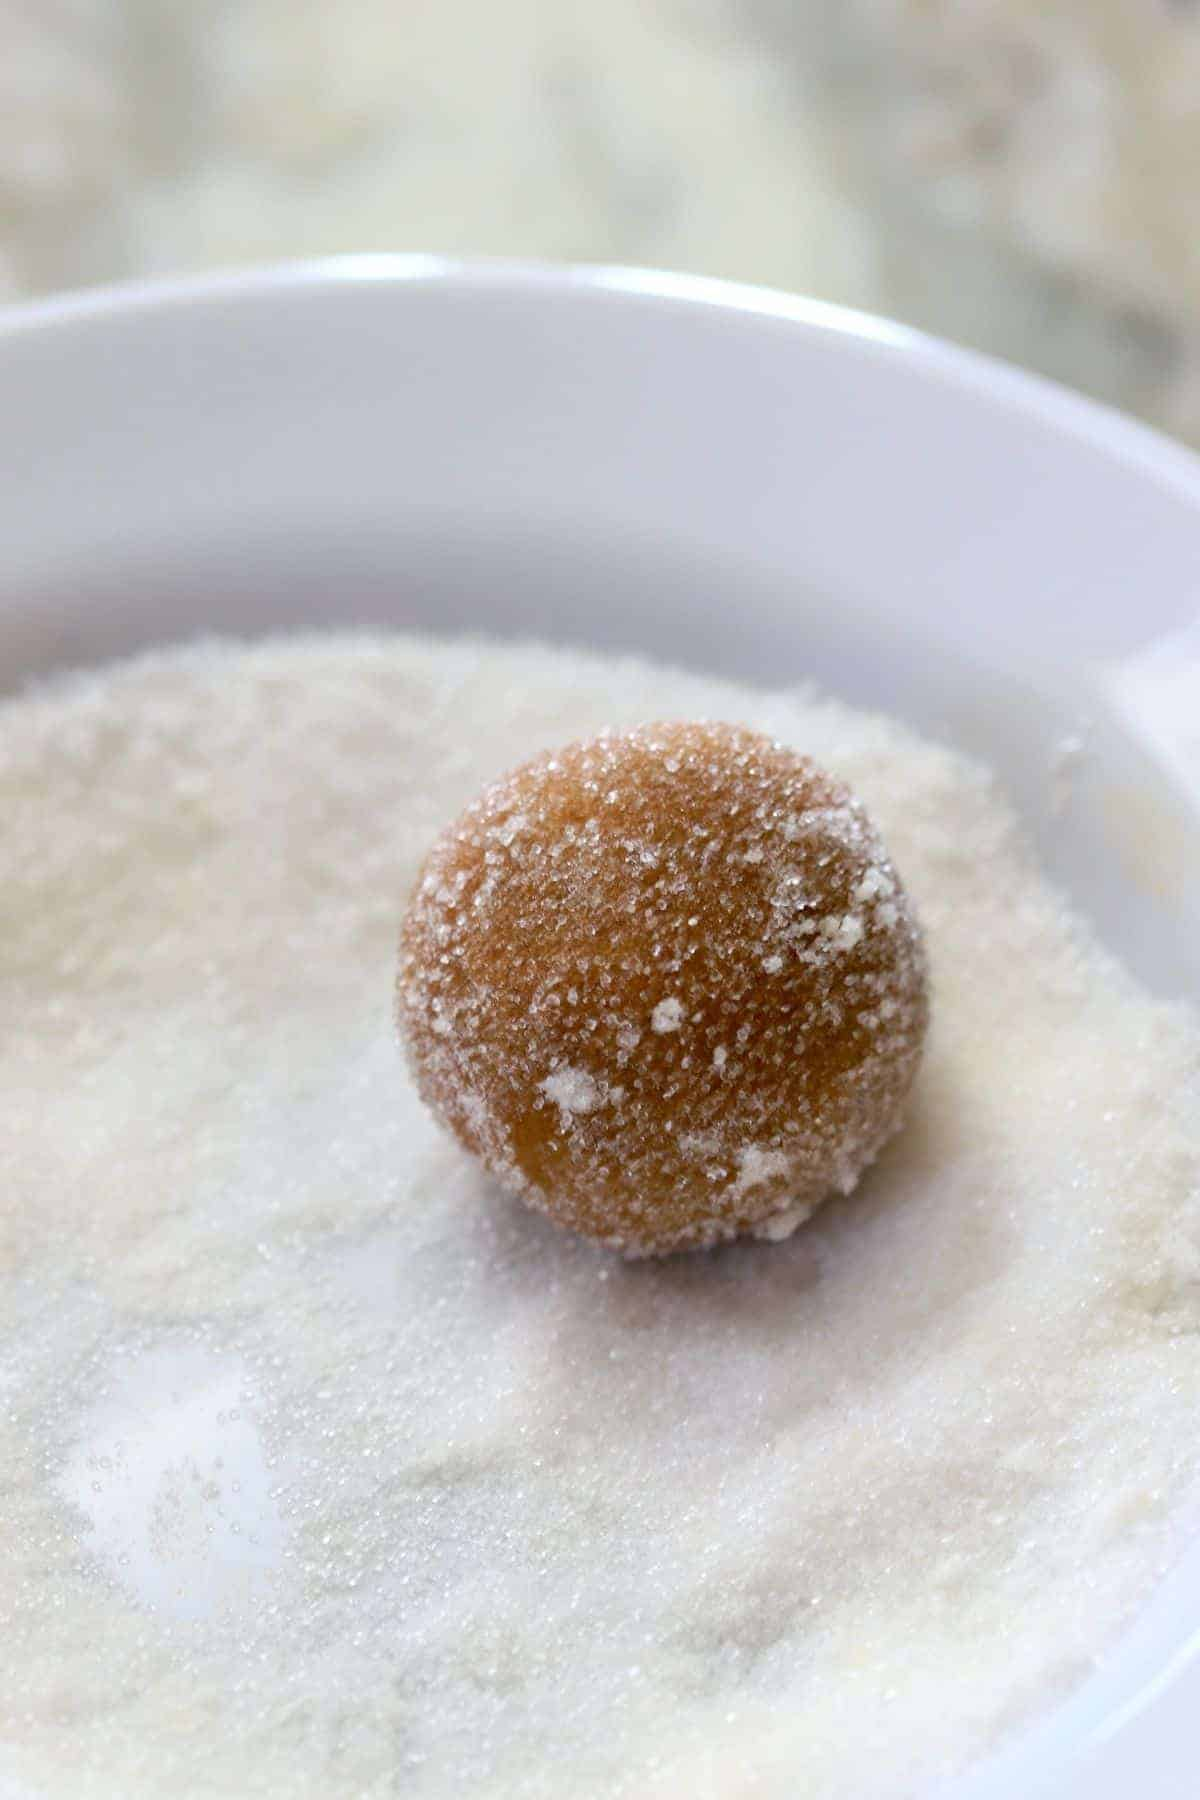 cookie dough ball coated in sugar in a sugar bowl